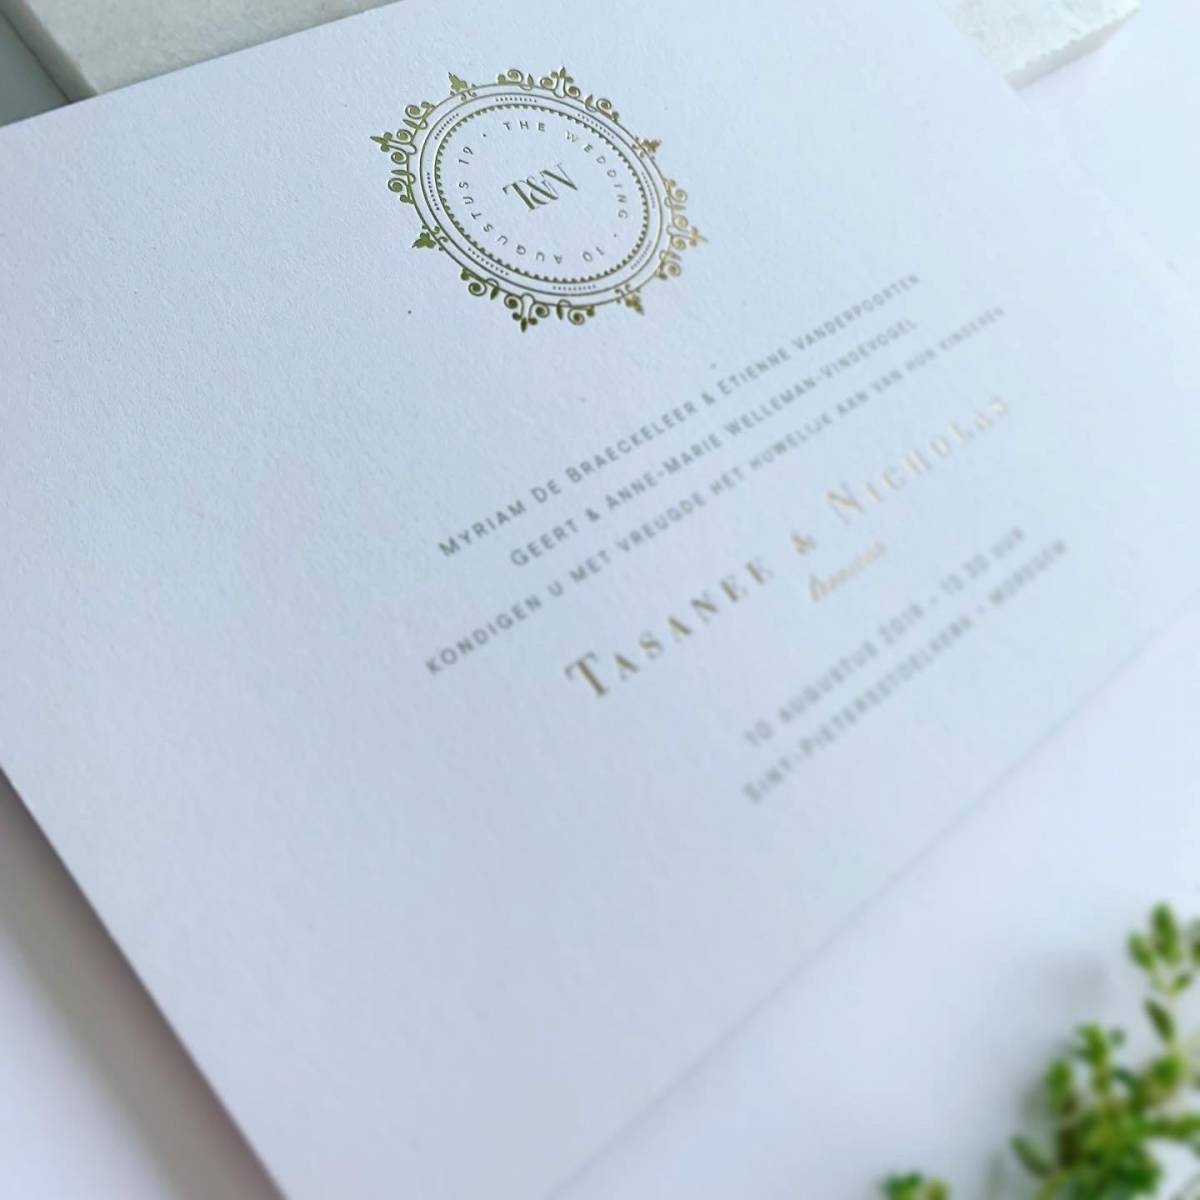 Scarabar - Trouwuitnodiging - Huwelijksuitnodiging - Drukwerk - Huwelijk - Trouw - Bruiloft - House of Weddings - 27